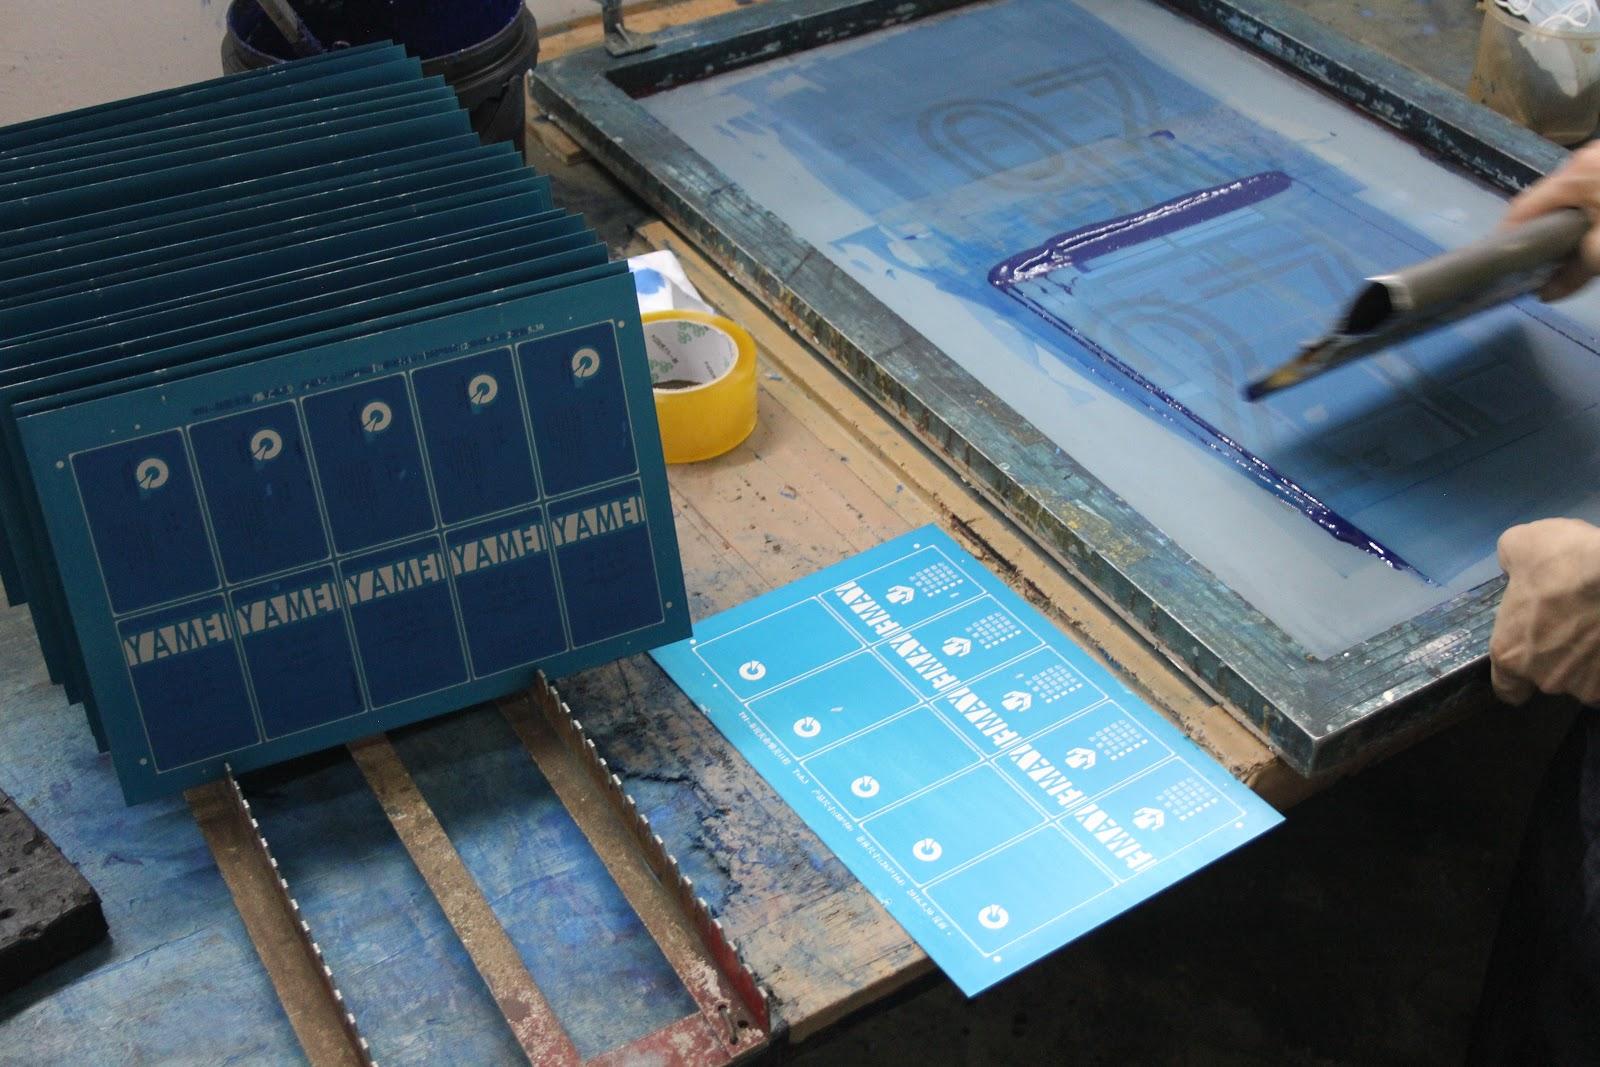 My Metal Business Card  Wtjj4I65Emeqiaa8V Jlnrpntwczg Wgkuyhlxxs2Fun2Xaencnc2O7Erhxrscmyjtrbue63Mxafeoscqsdll Pory7 V A Iupln E Eoe2Ofa5At Zvvqv8Kp04Mvhibvlkg2S